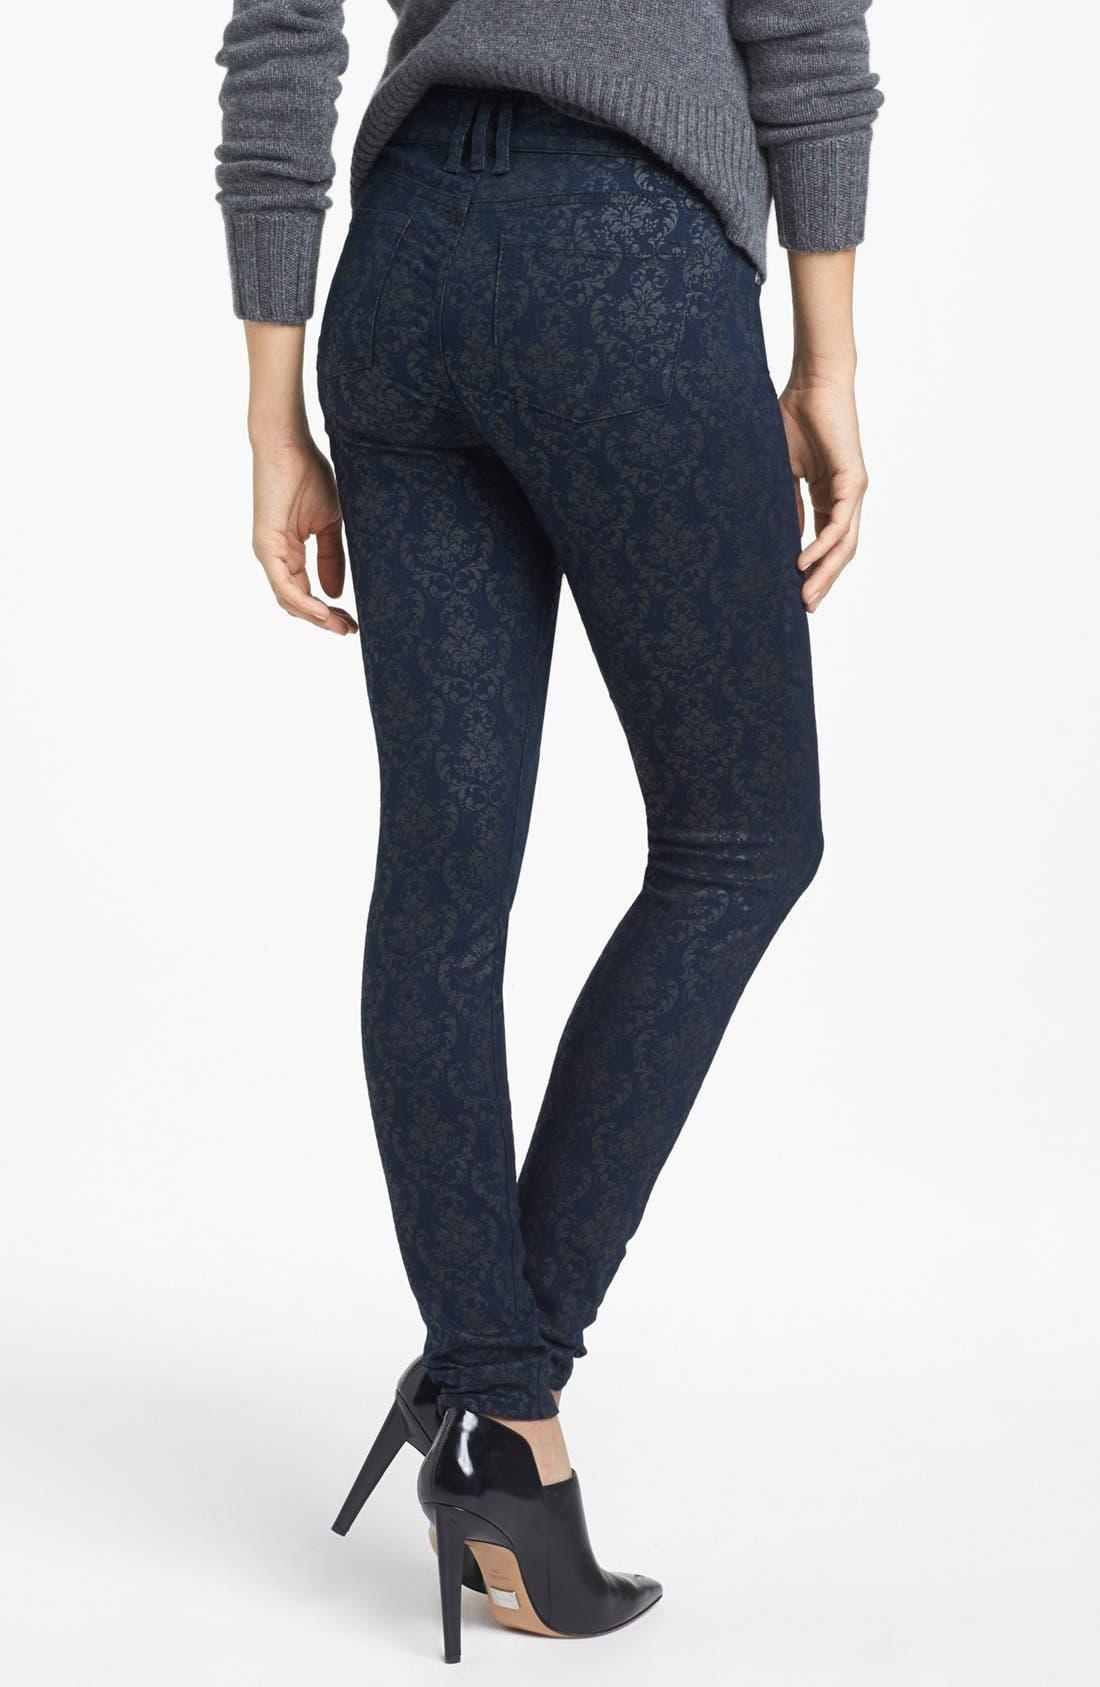 Alternate Image 2  - KUT from the Kloth 'Mia' Print Skinny Jeans (Indigo)